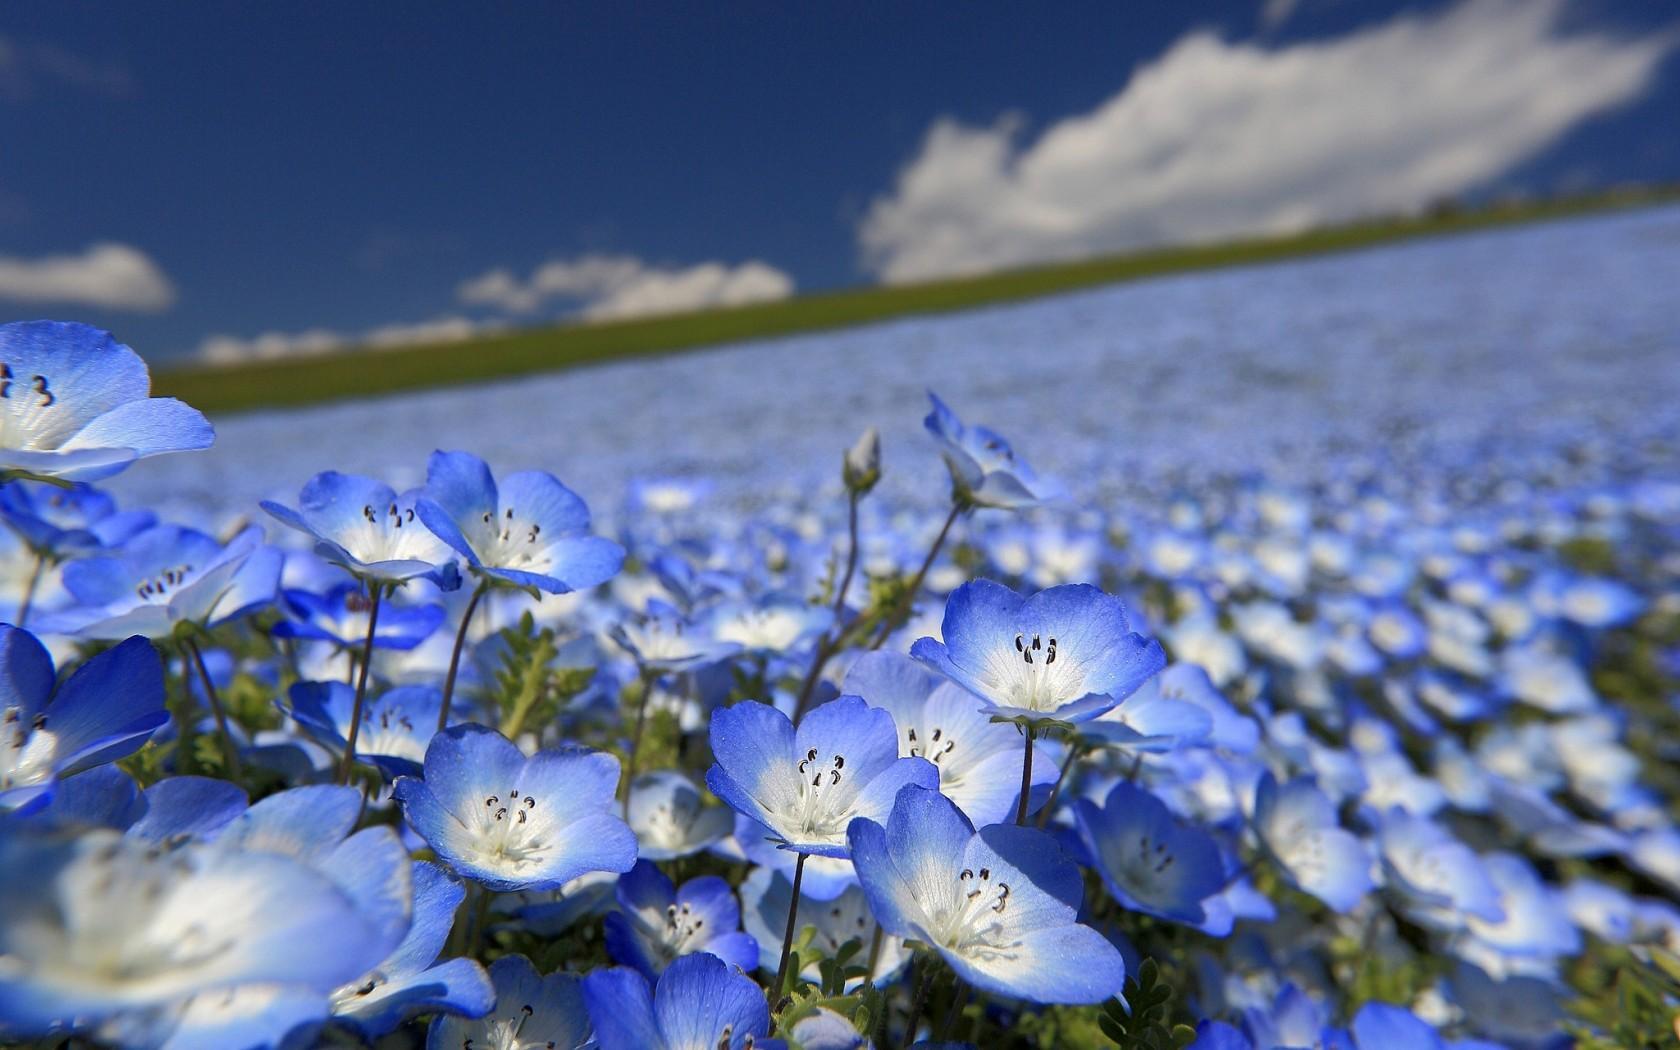 Blue Flower Wallpaper - WallpaperSafari